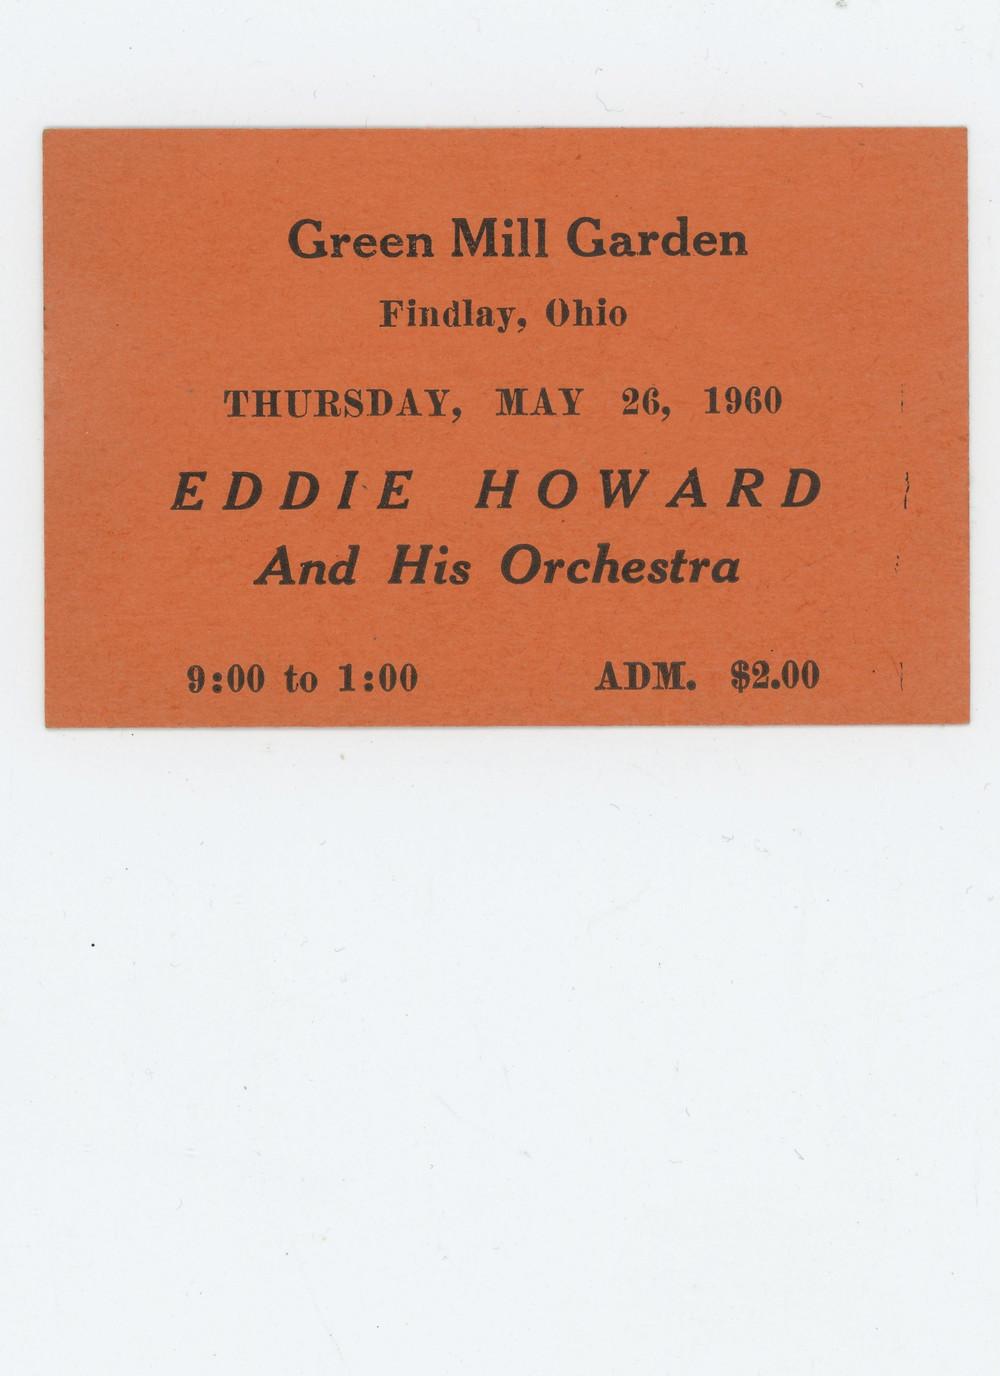 Eddir Howard 1960 Plays Findlay, Ohio